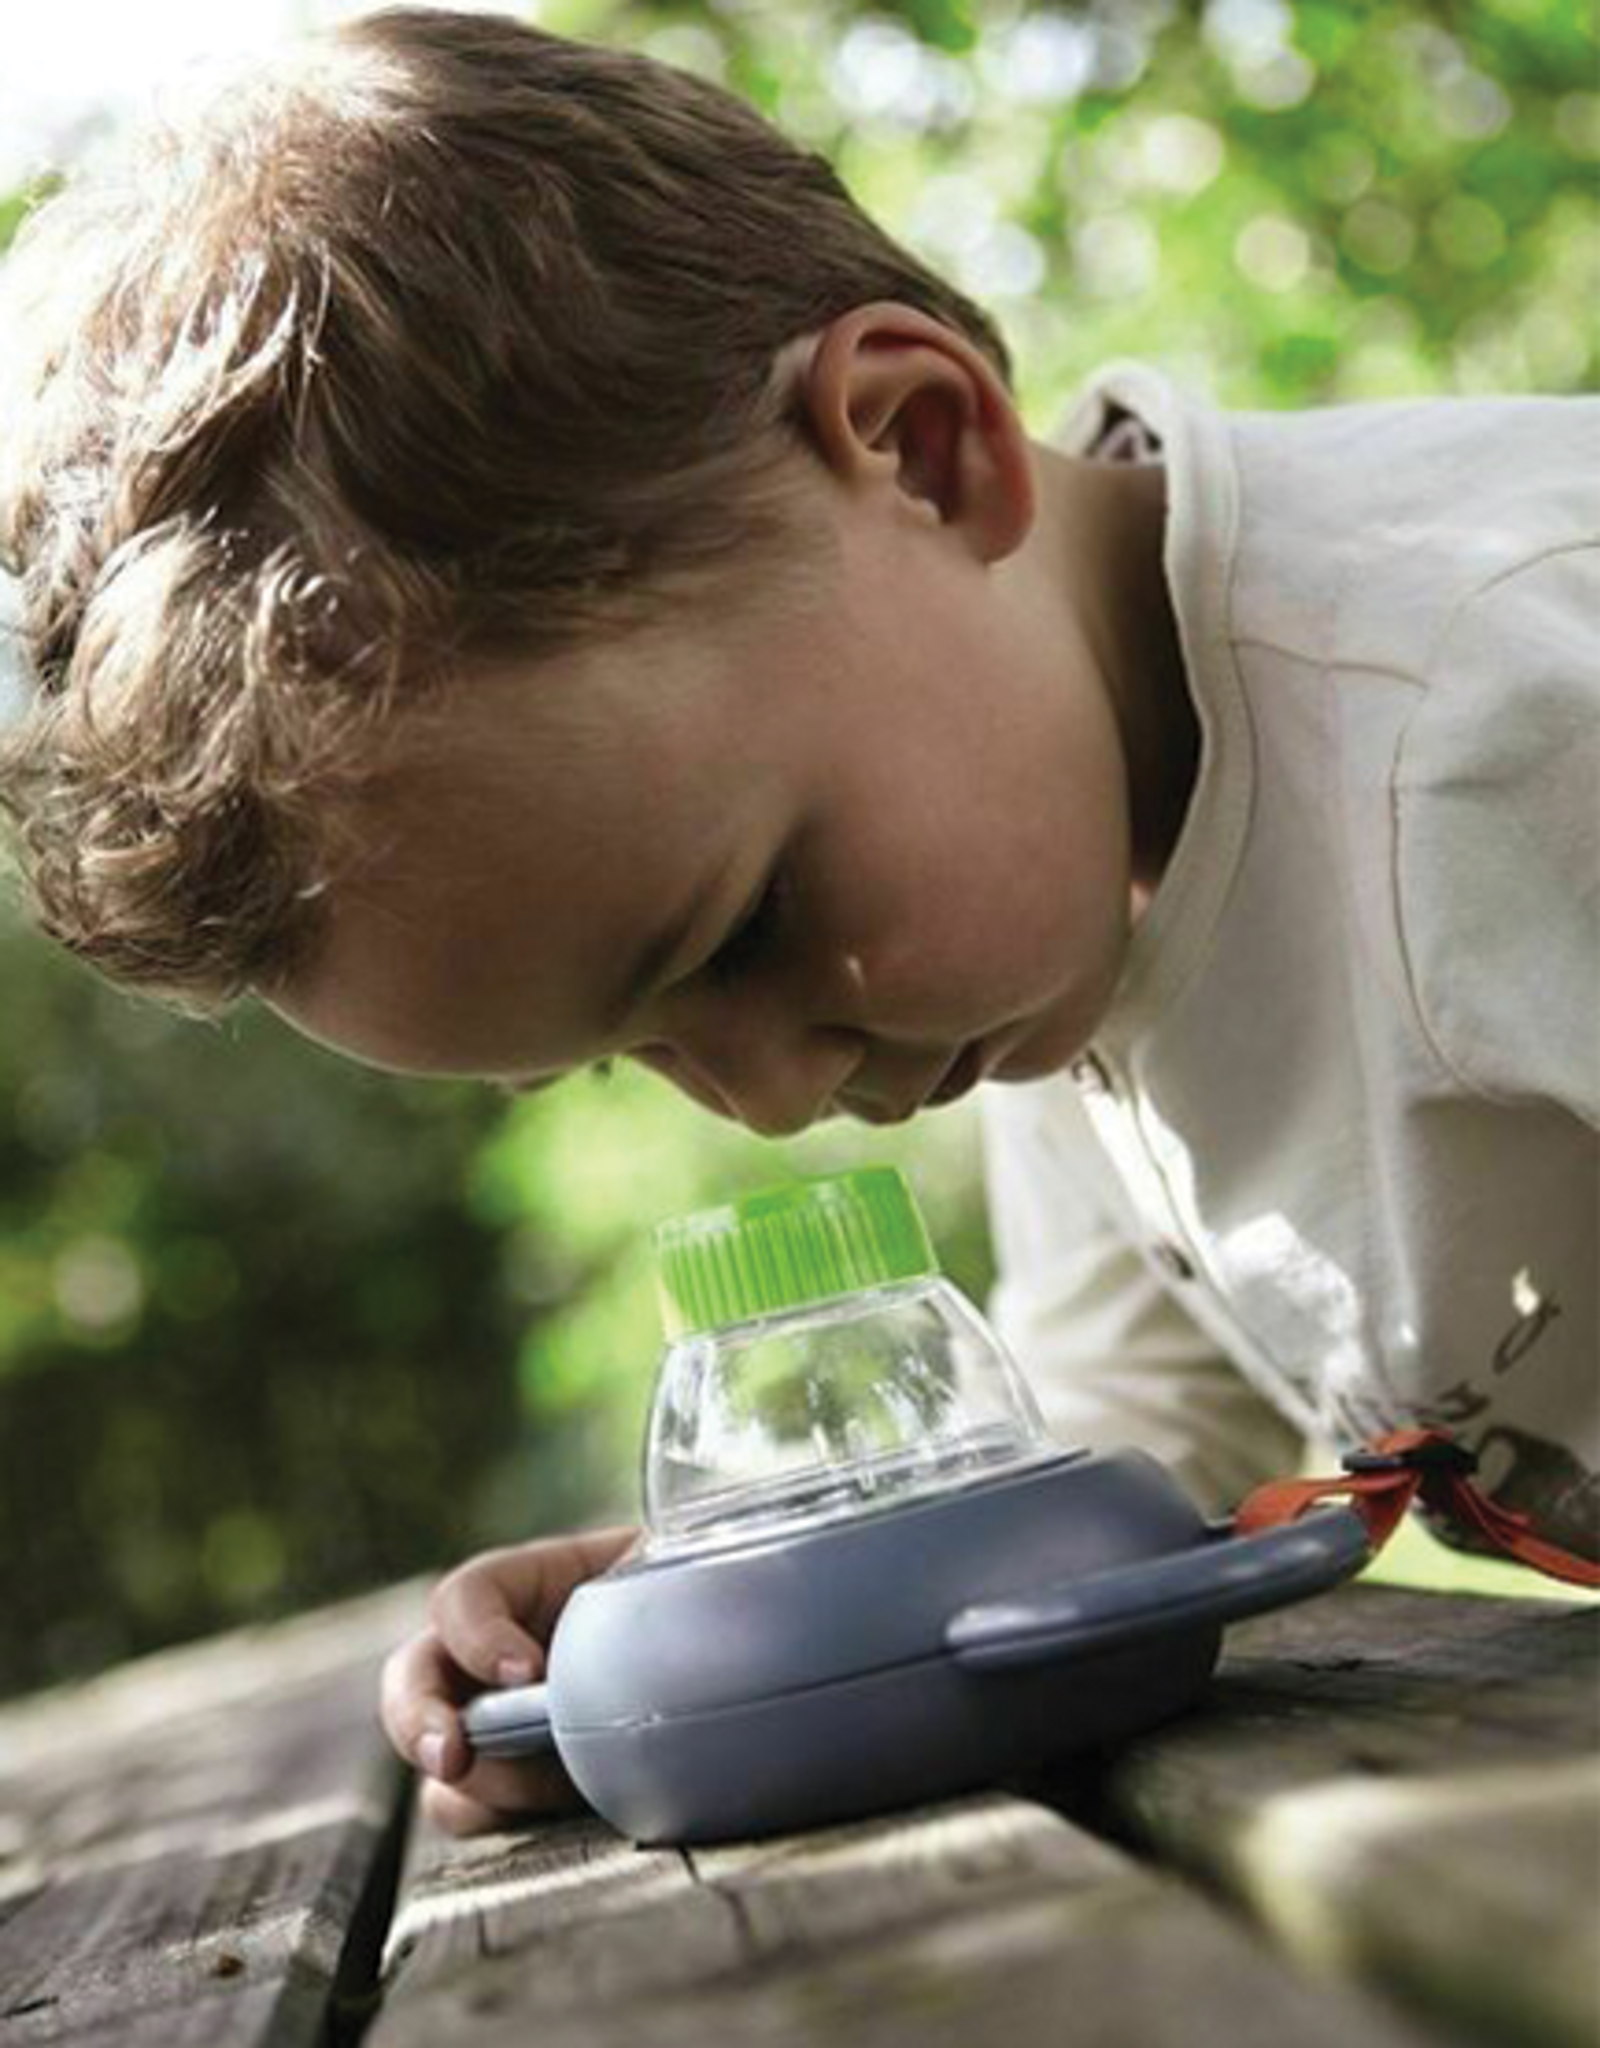 Haba Terra Kids Exploration Magnifier